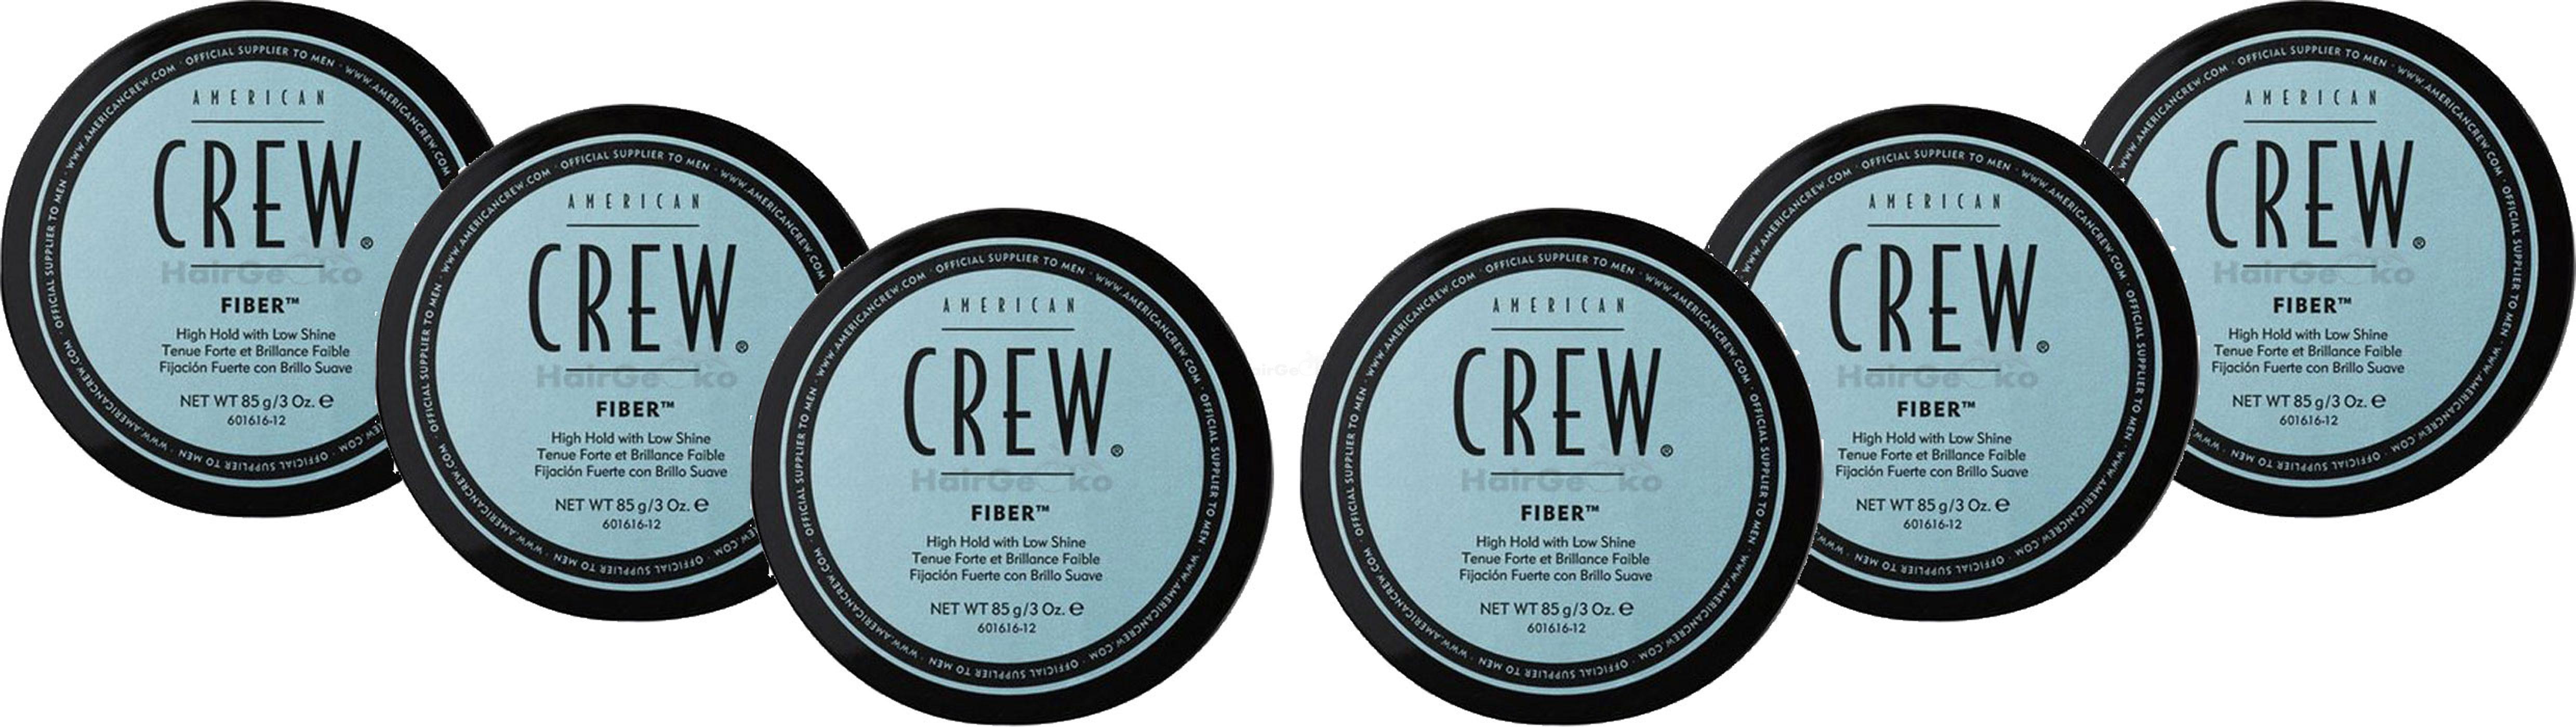 American Crew Fiber Aktion - 6x 85g = 510g